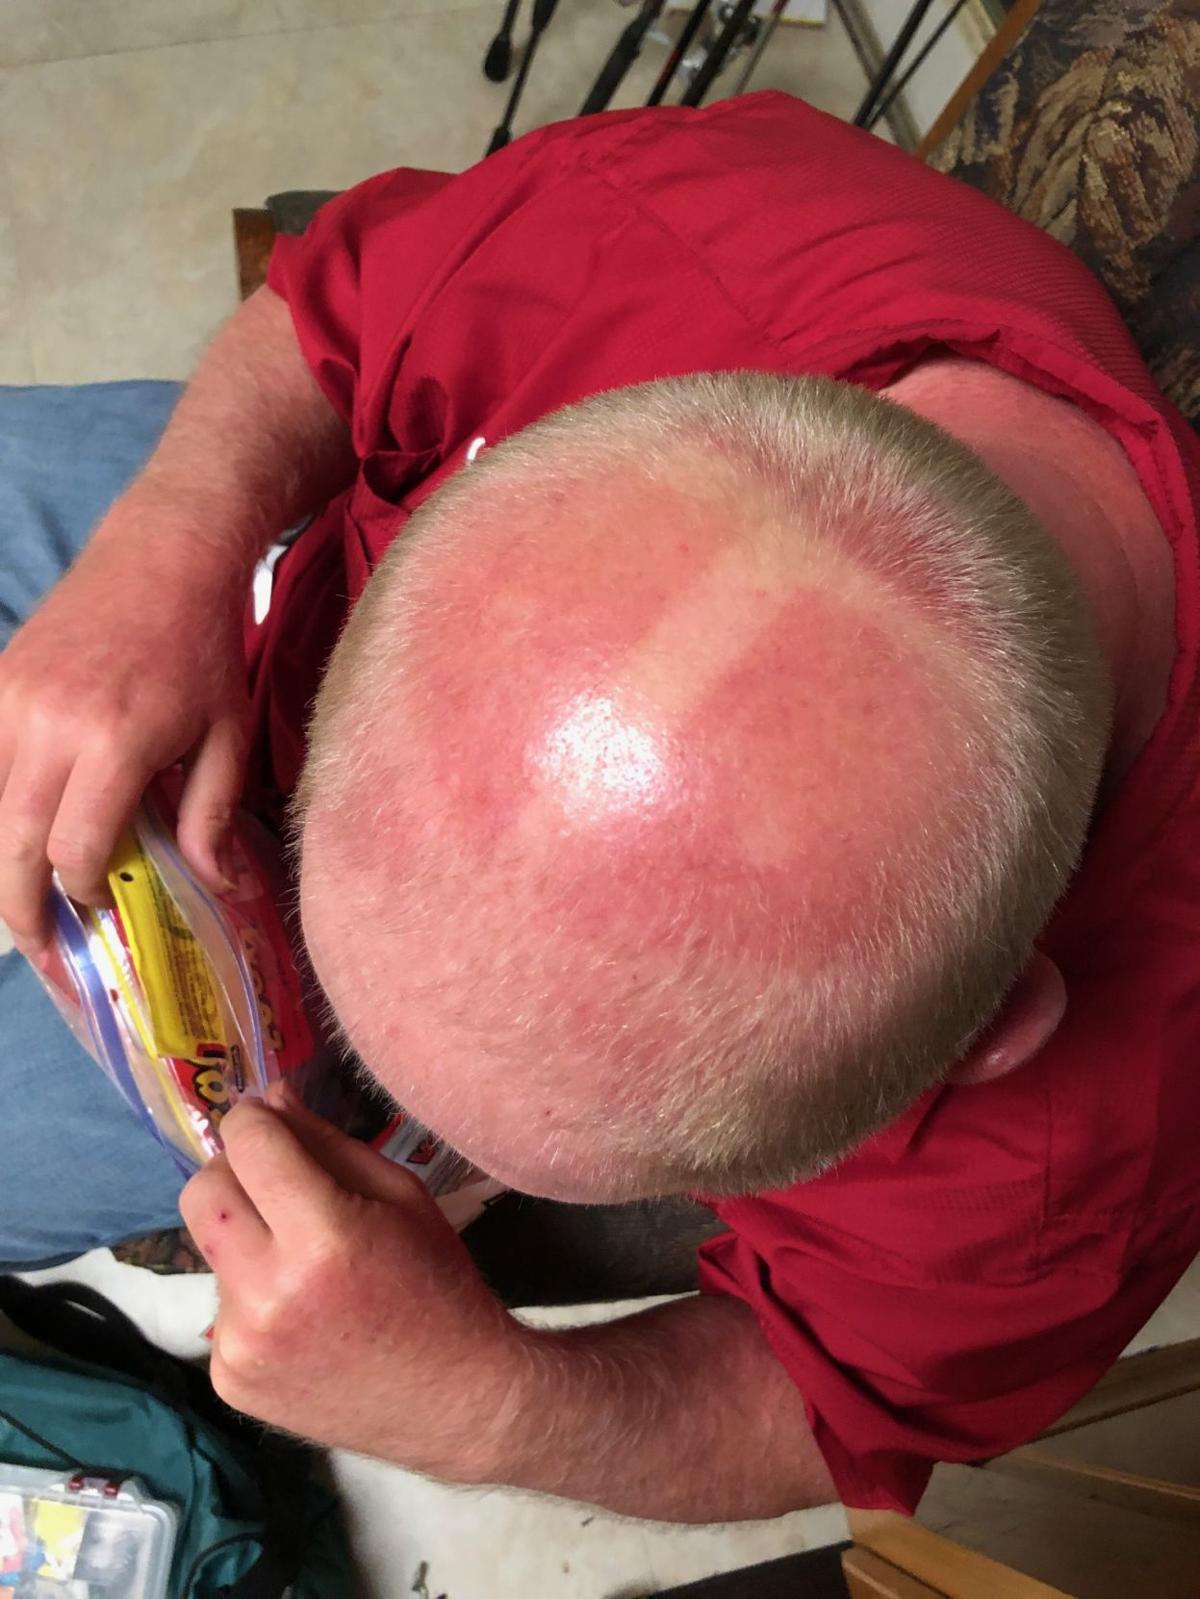 Bald Tan Line